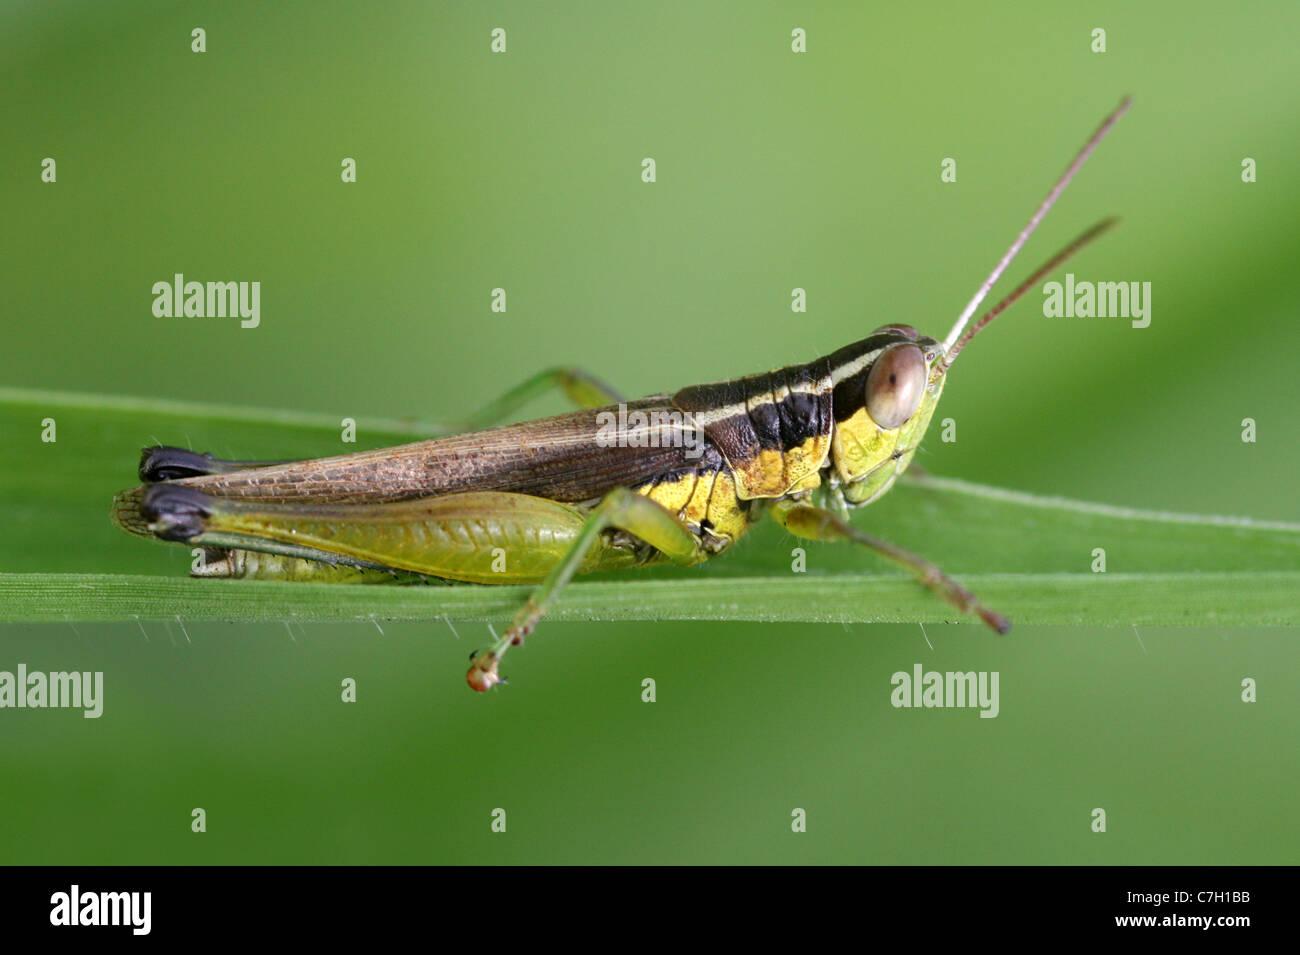 Grasshopper In Sumatra, Indonesia - Stock Image